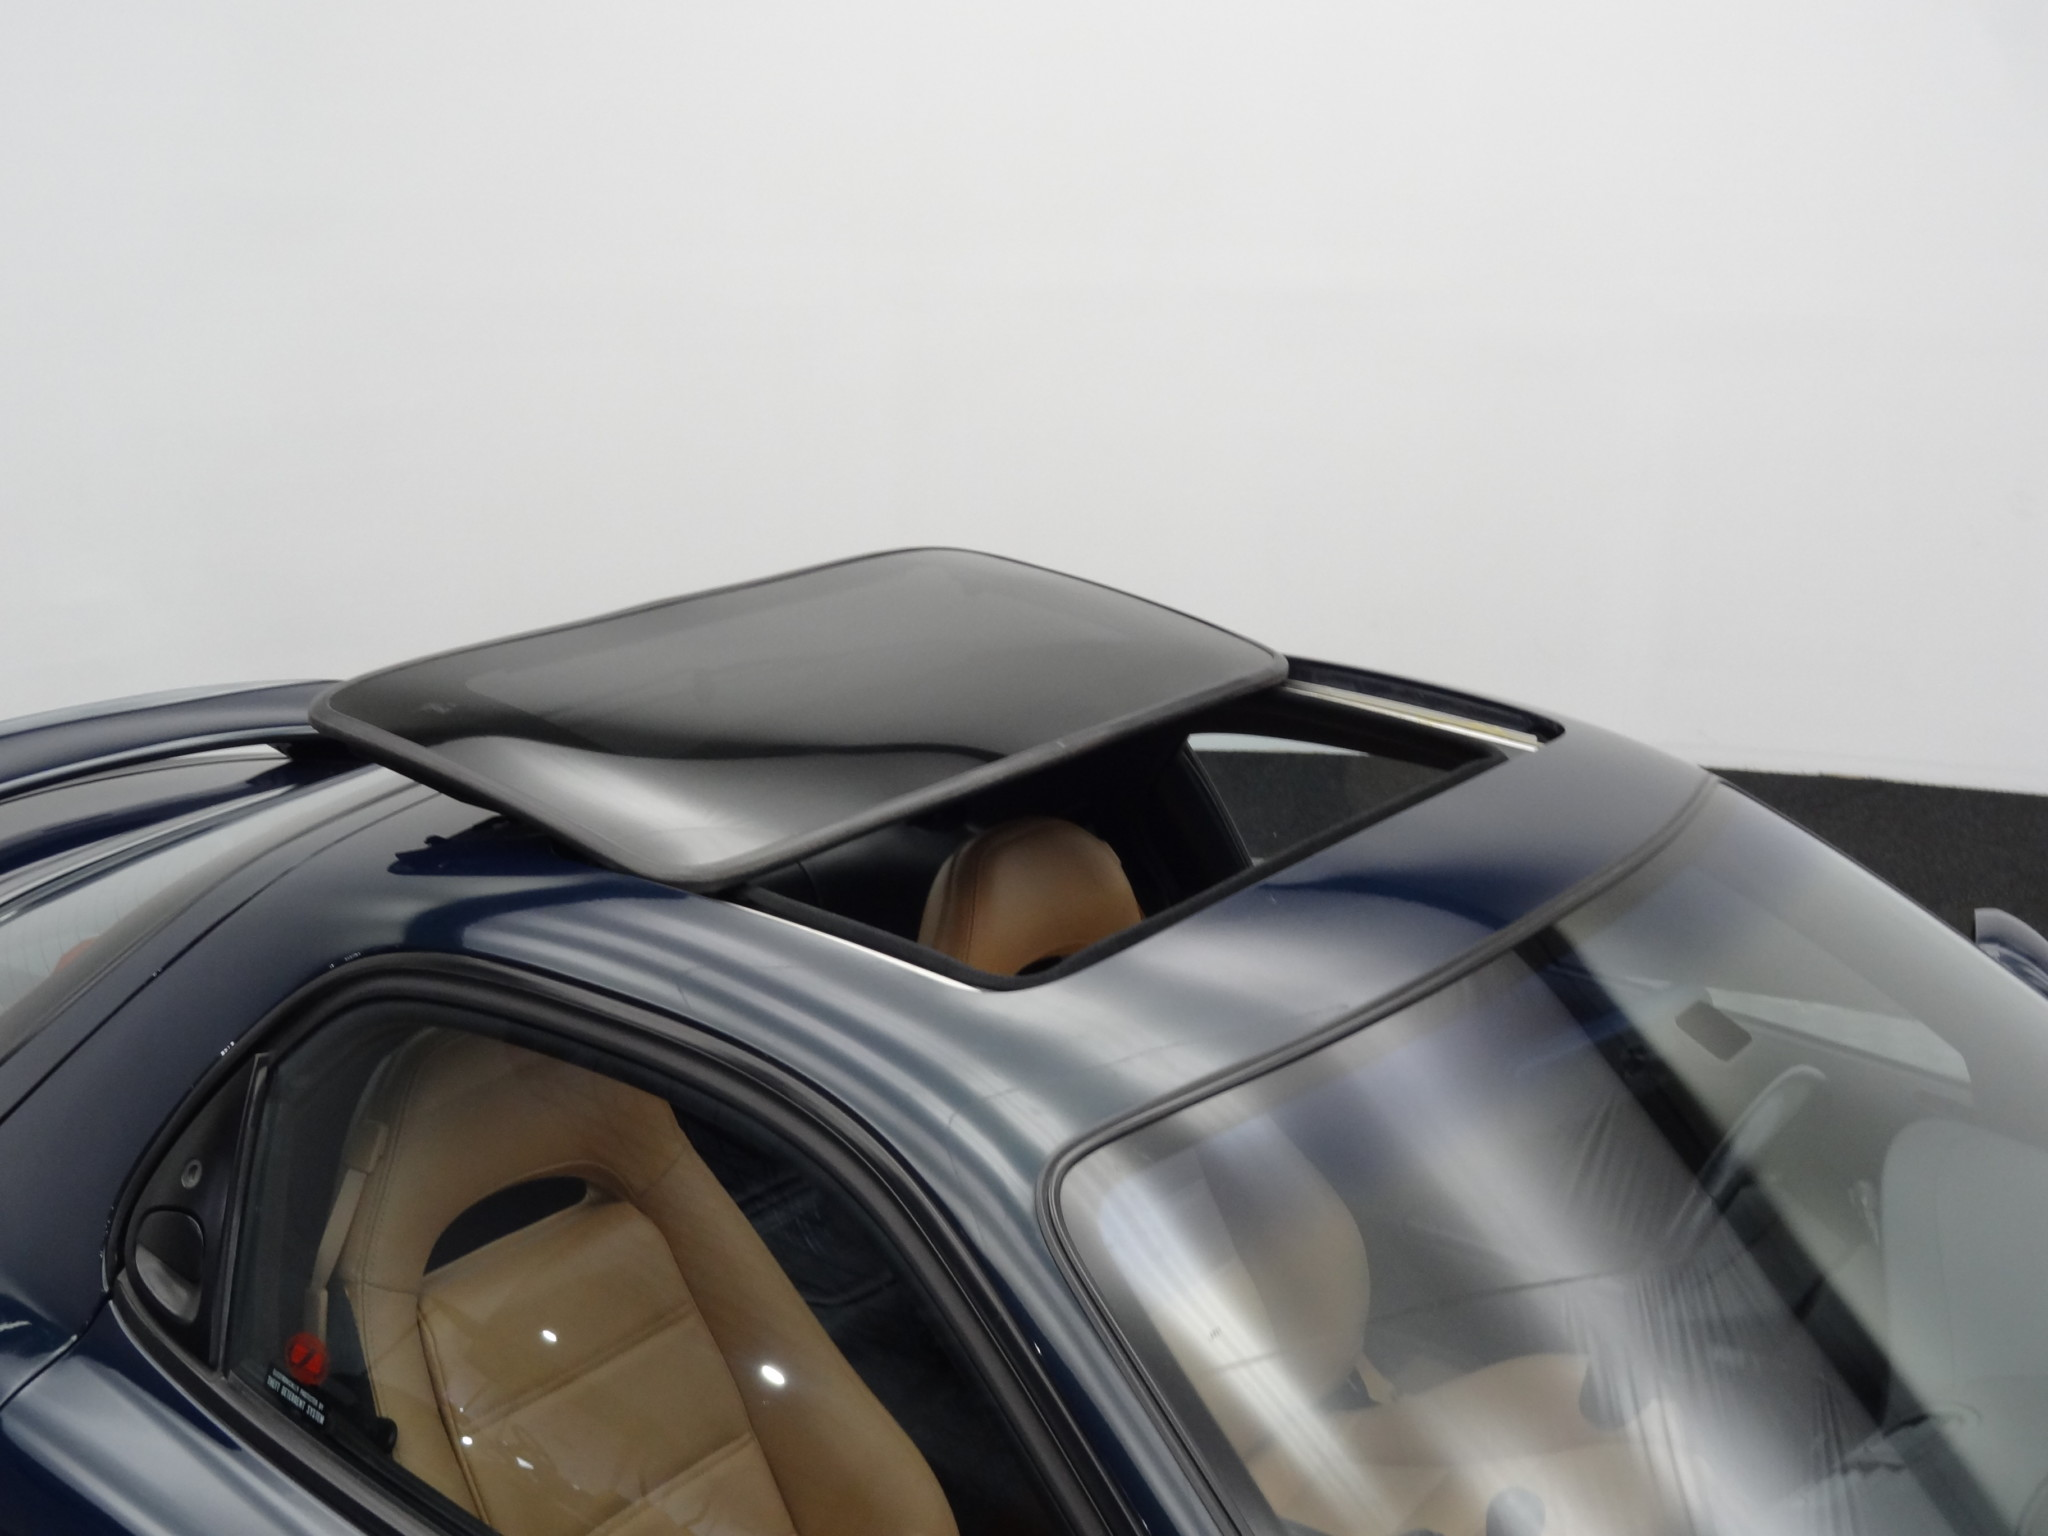 1994 Mazda RX-7 sun roof